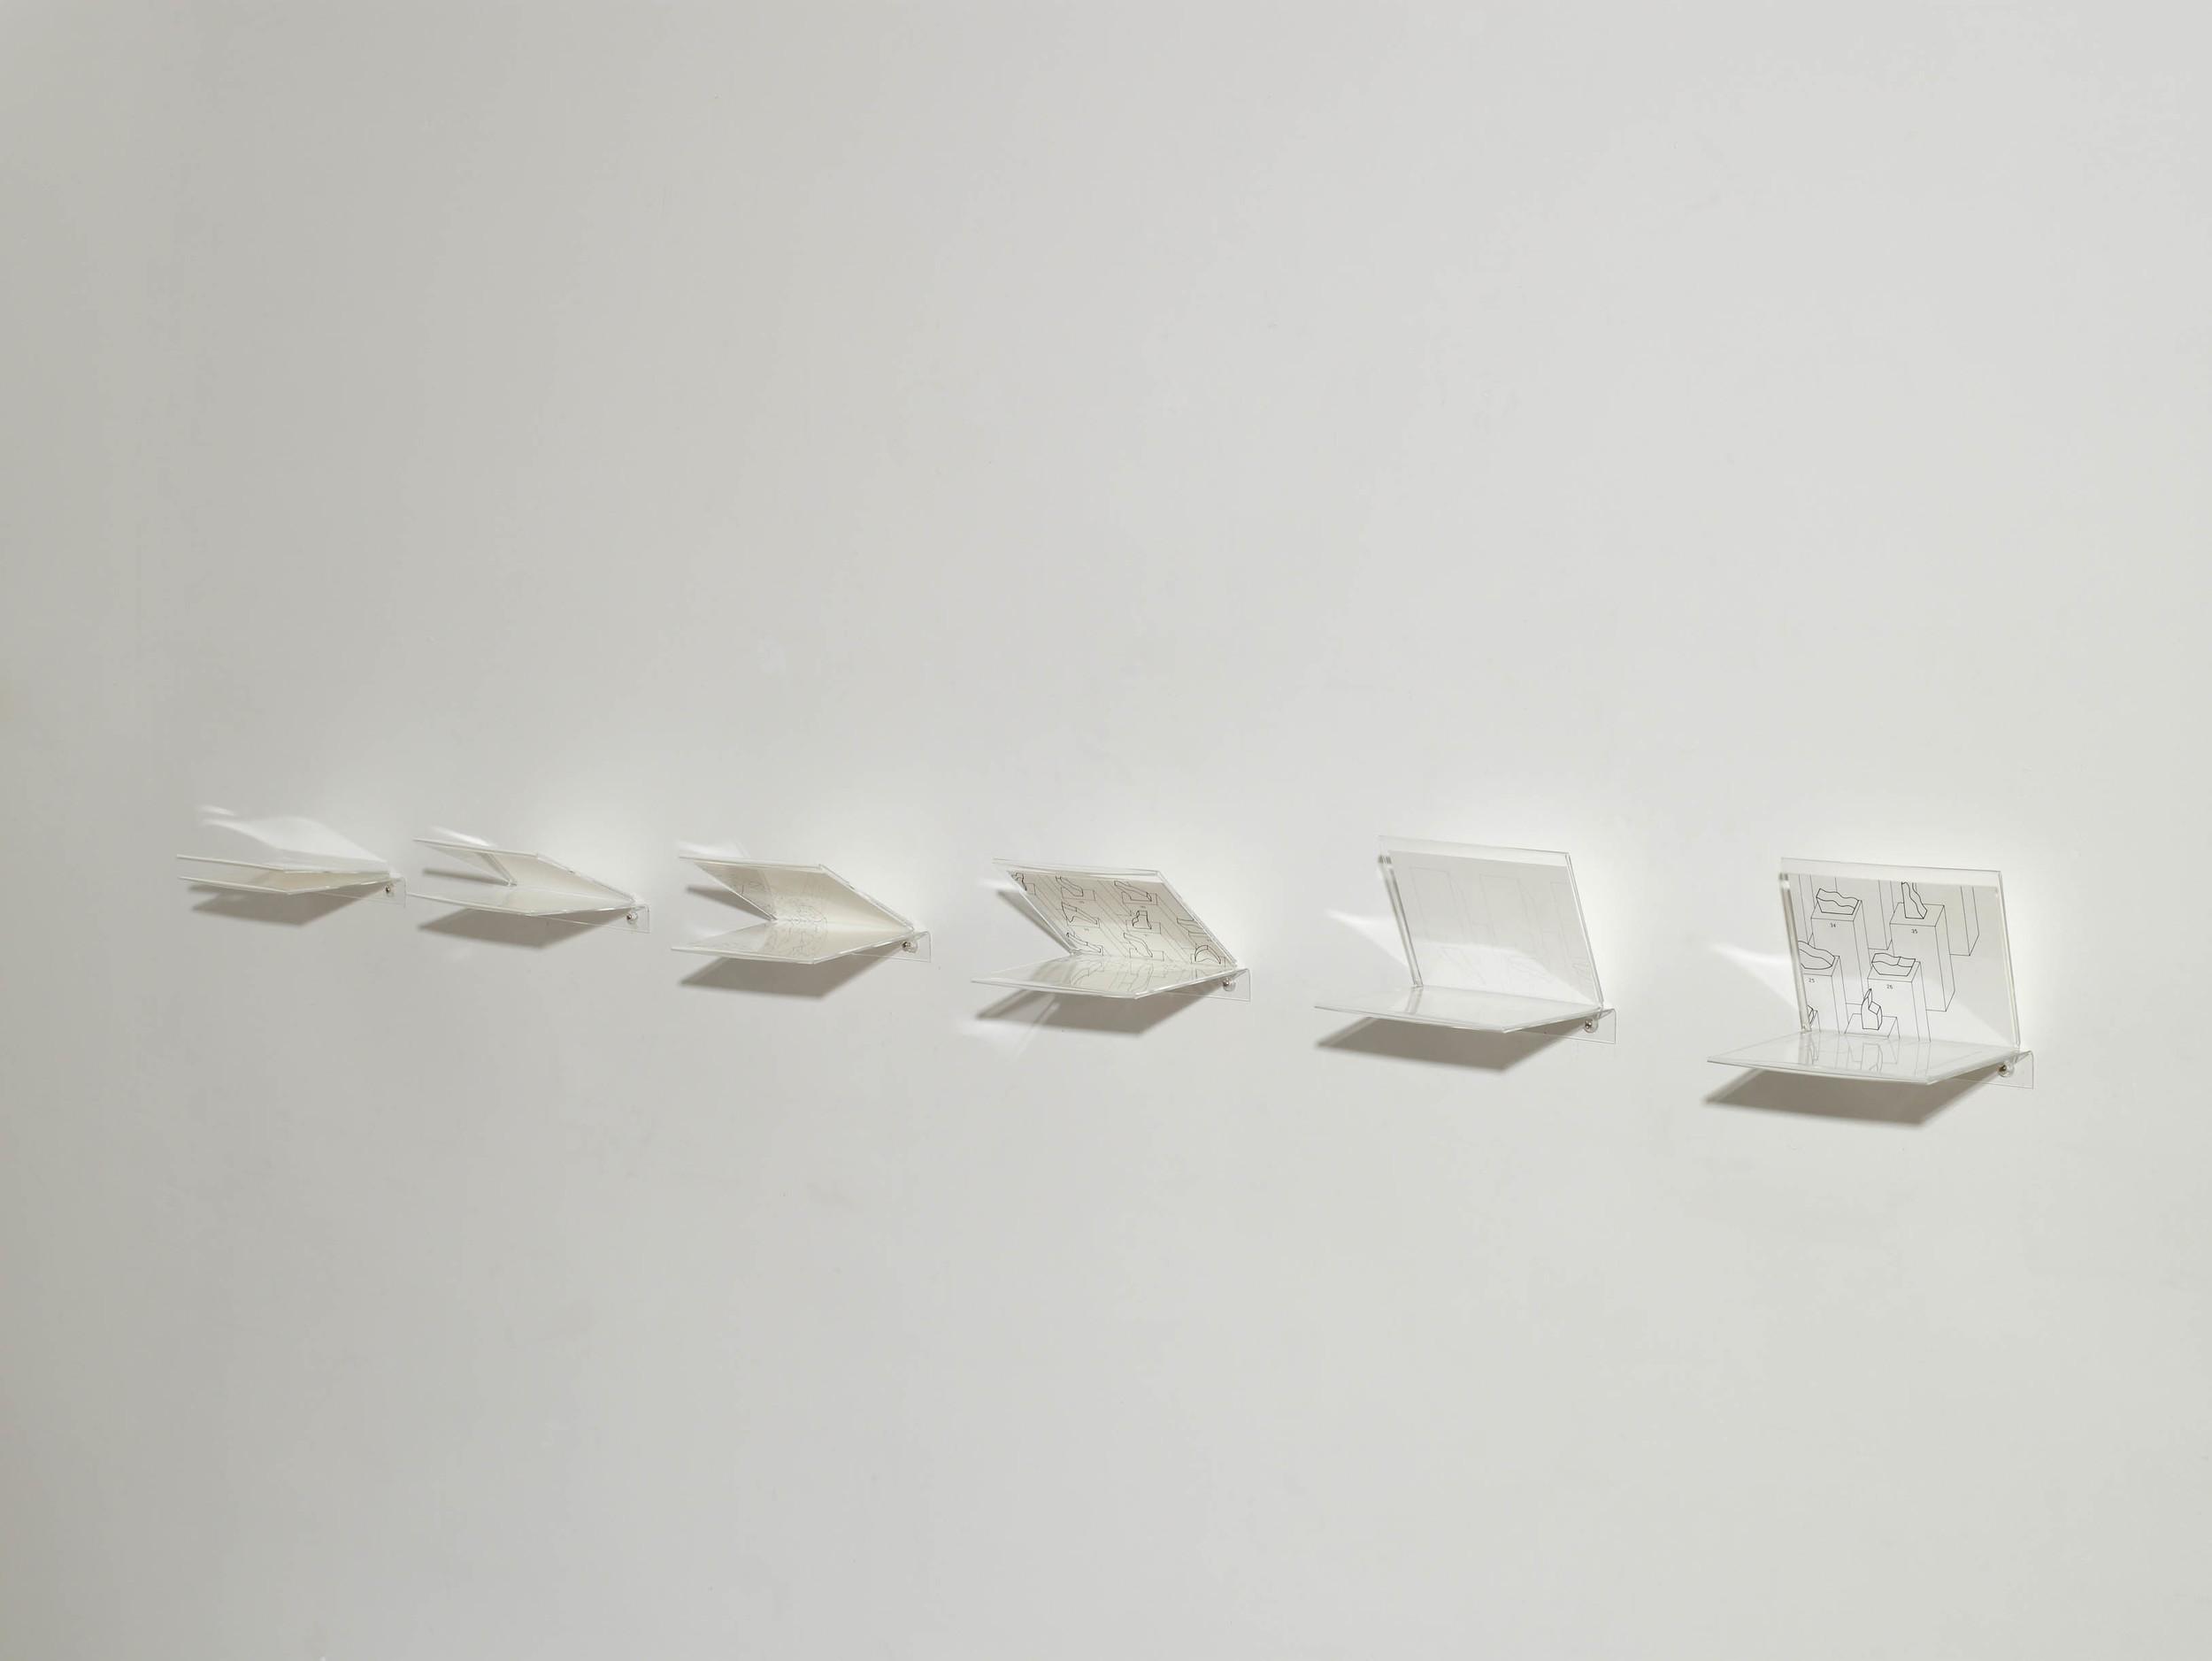 "Fernanda Fragateiro  Utopien , 2009 kursbuch n52 with insert of: Enzo Mari, ""44 Evaluations"" 1976 for the Venice Bienal; 6 acrylic pieces, 23 x 33,5 x 16 cm (each), book 18.5 x 12.5 x 2.5 cm, variable dimension"